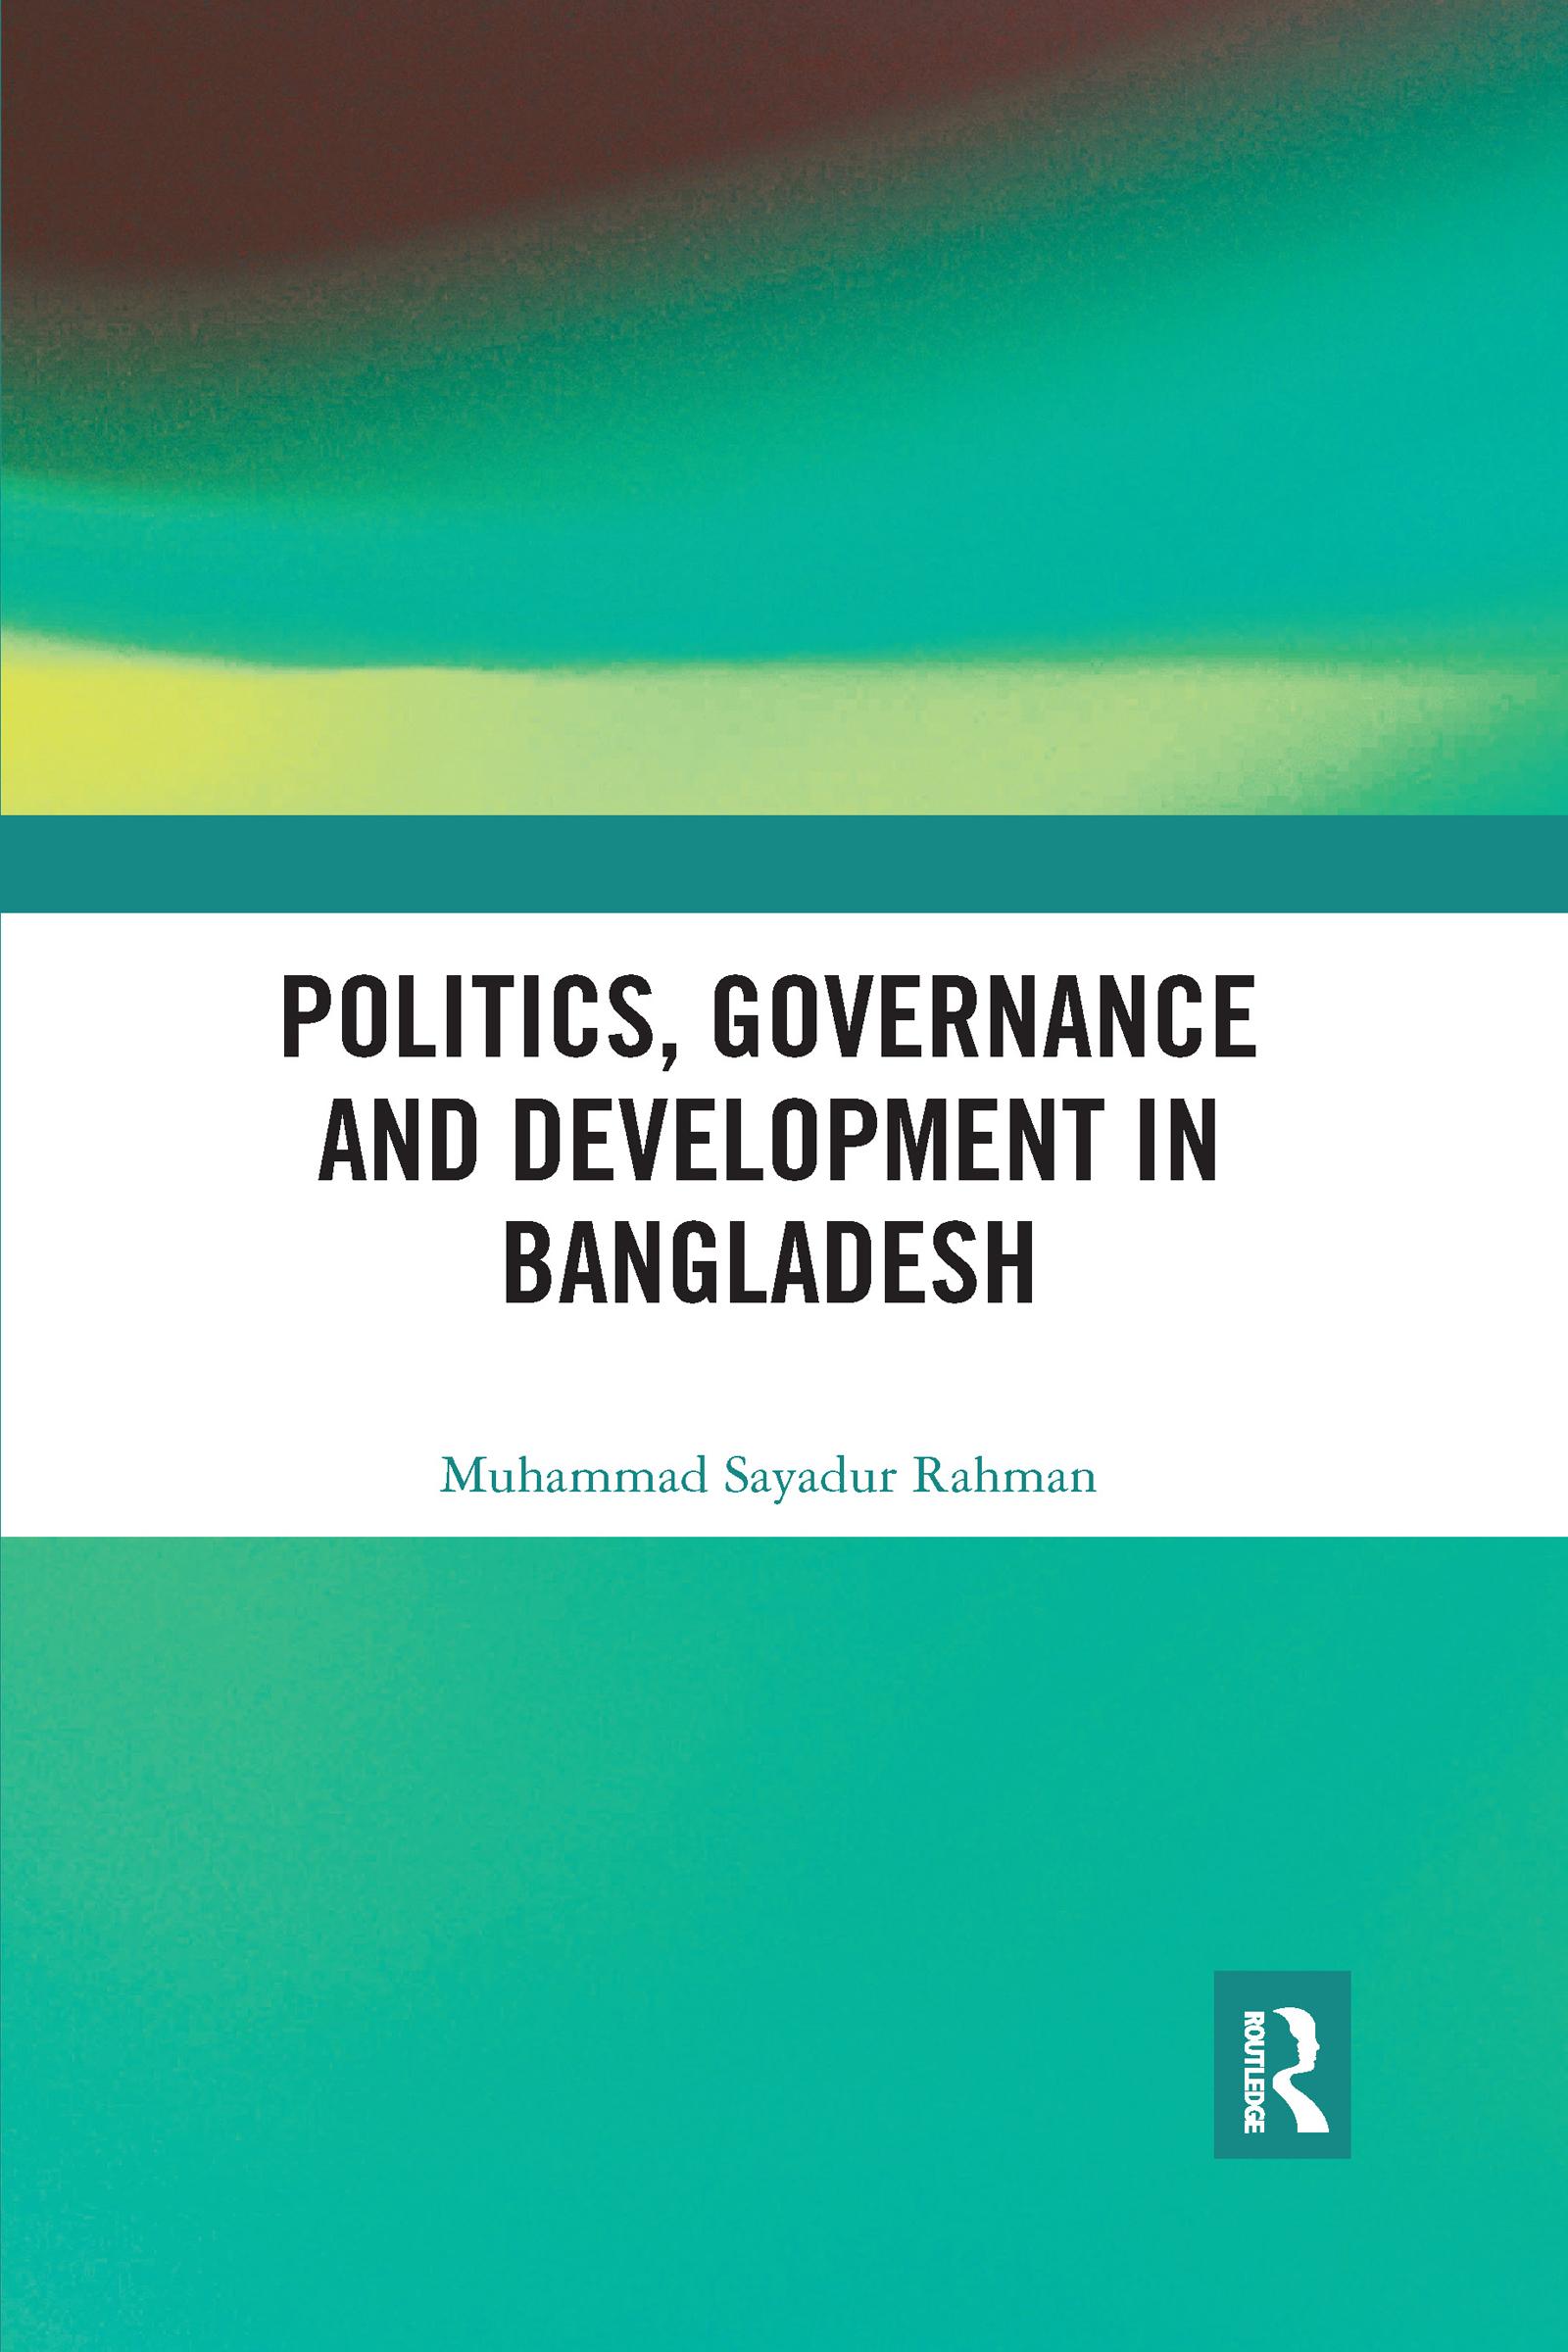 Politics, Governance and Development in Bangladesh